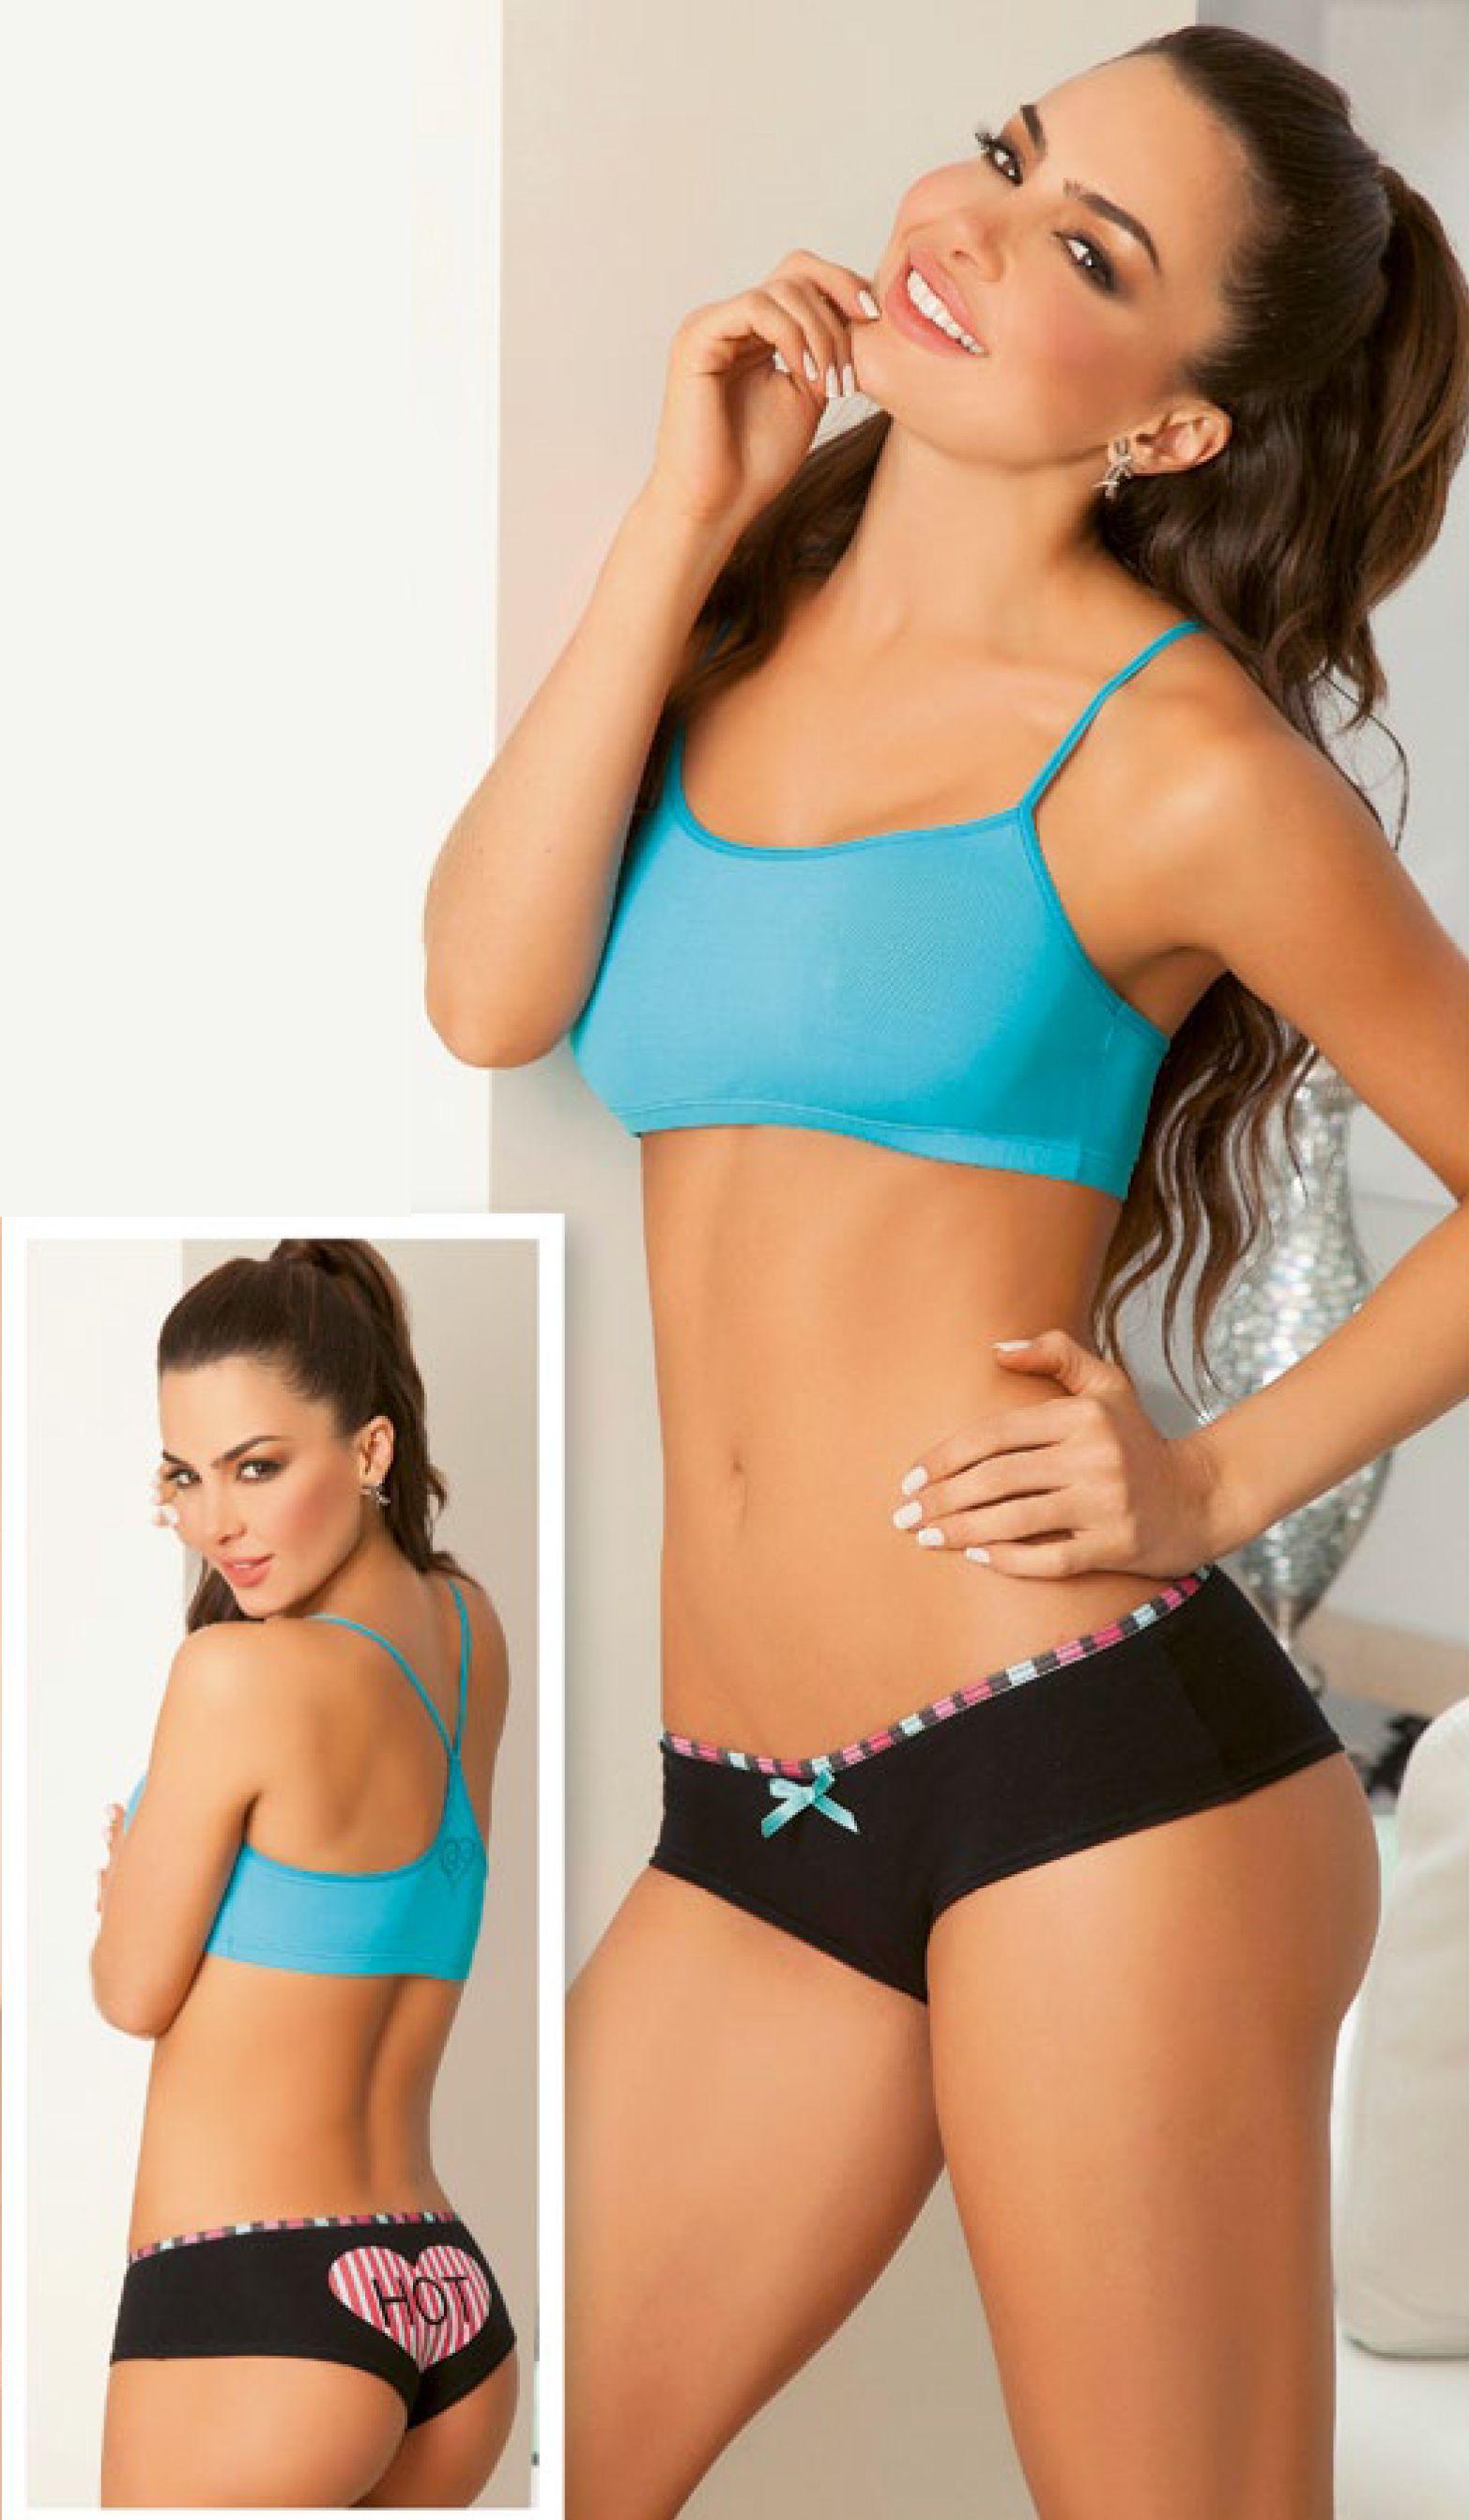 Lencer a ropa interior femenina - Ropa interior femenina sexis ...